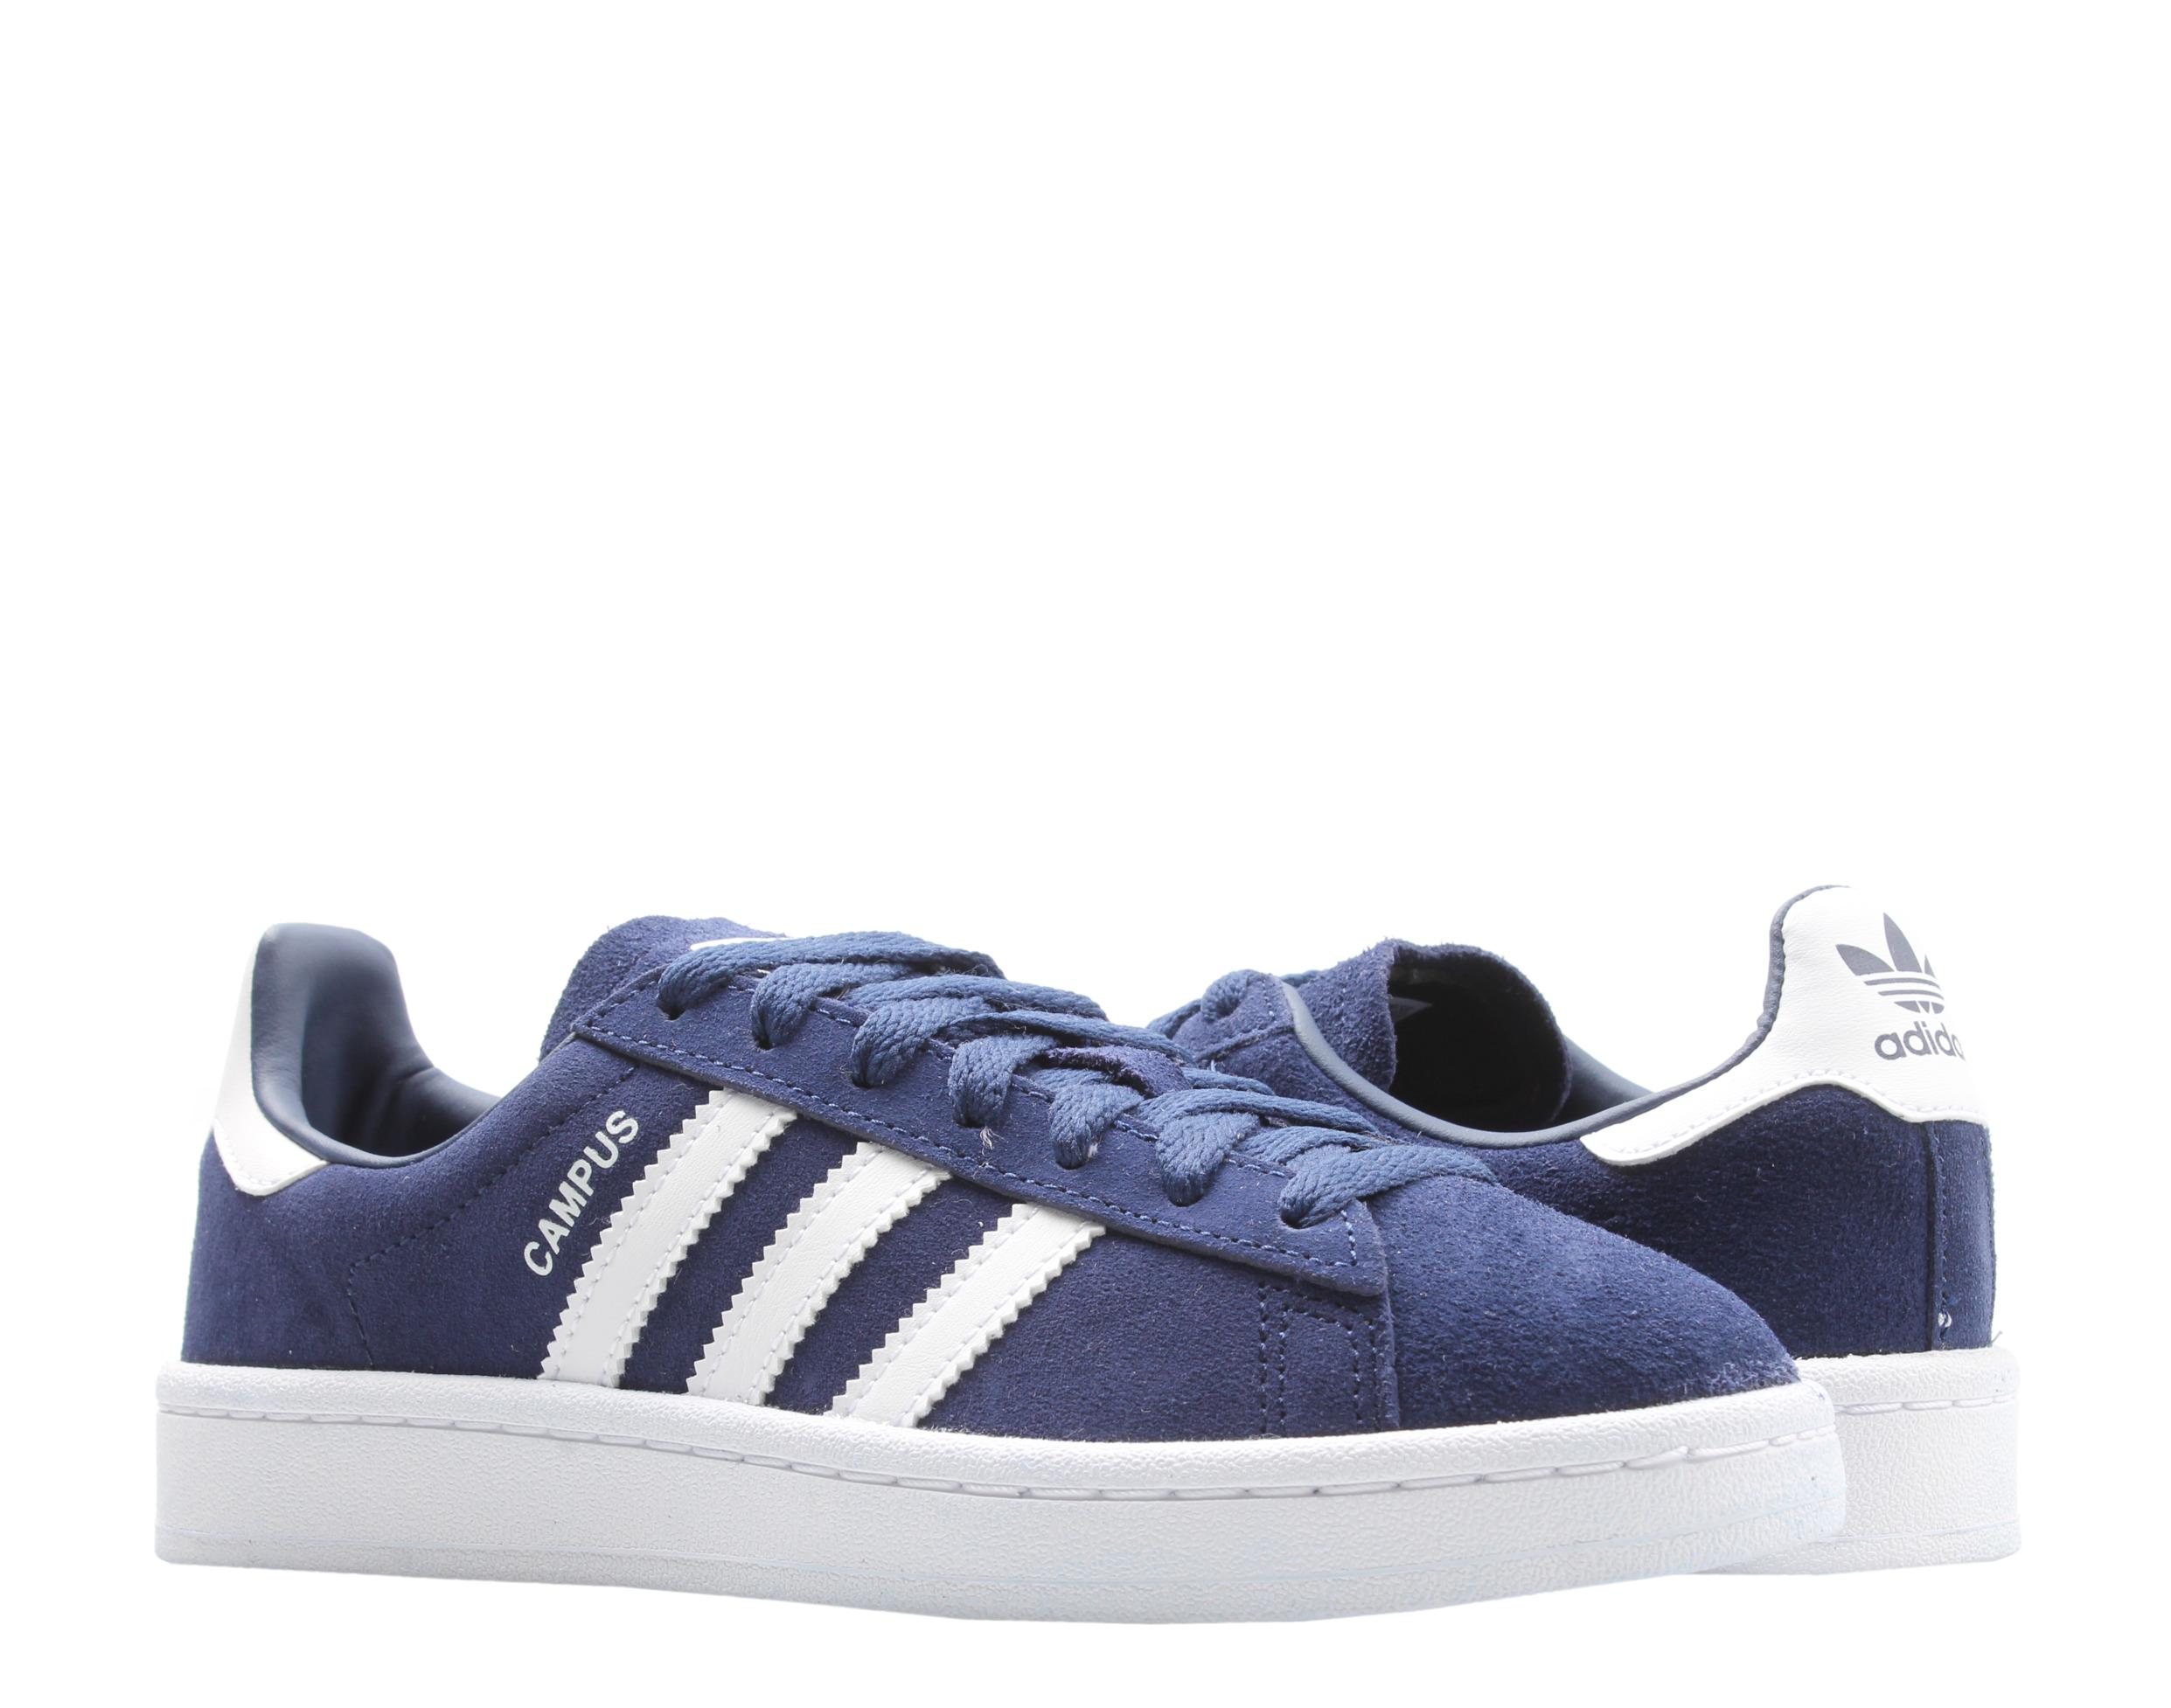 Adidas Originals Campus J Dark Blue/White Big Kids Casual Shoes ...